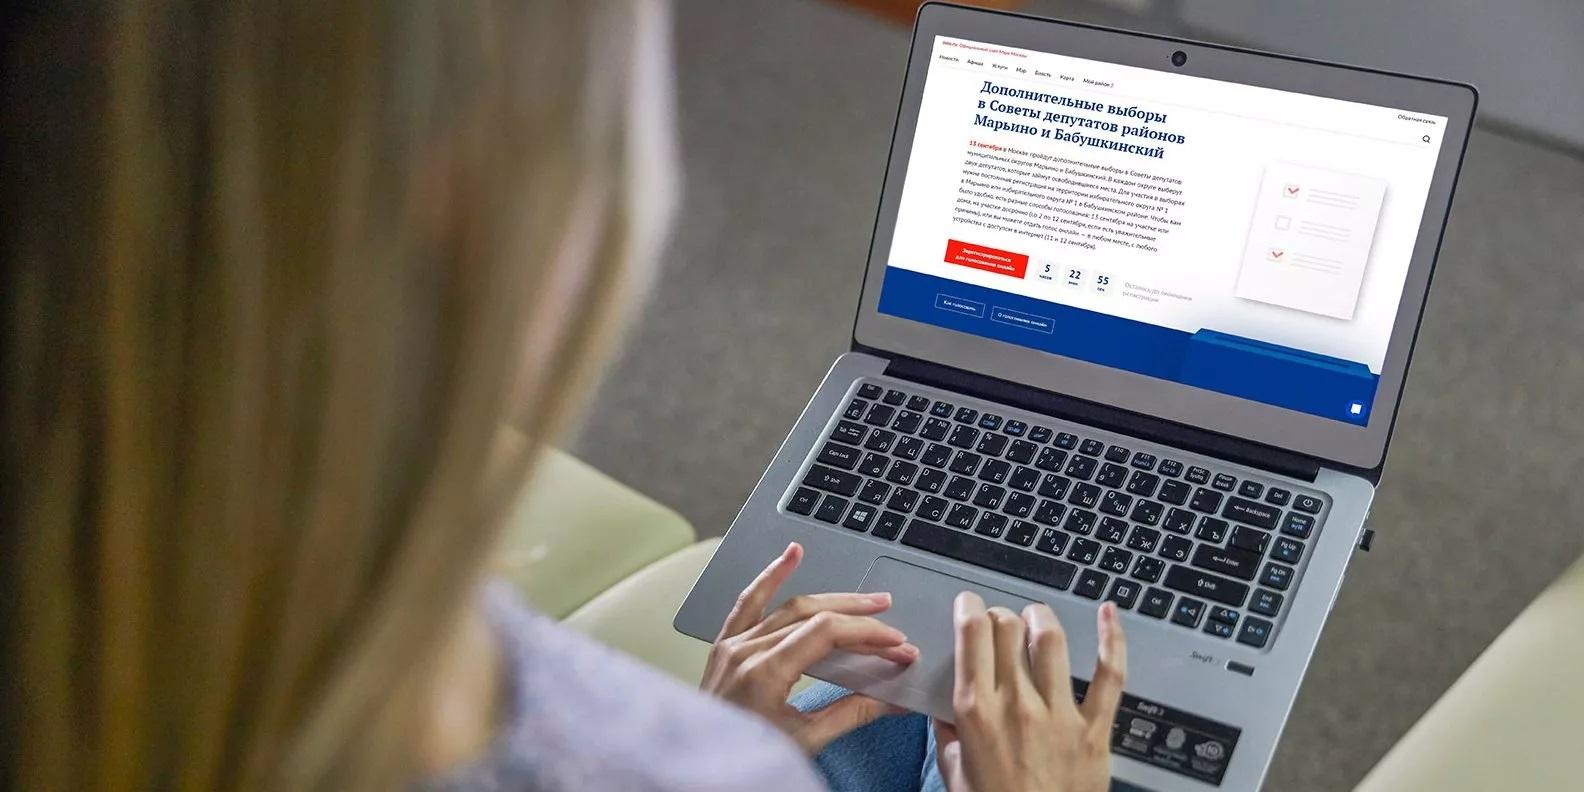 МГИК разделили ключ шифрования для онлайн-голосования на довыборах